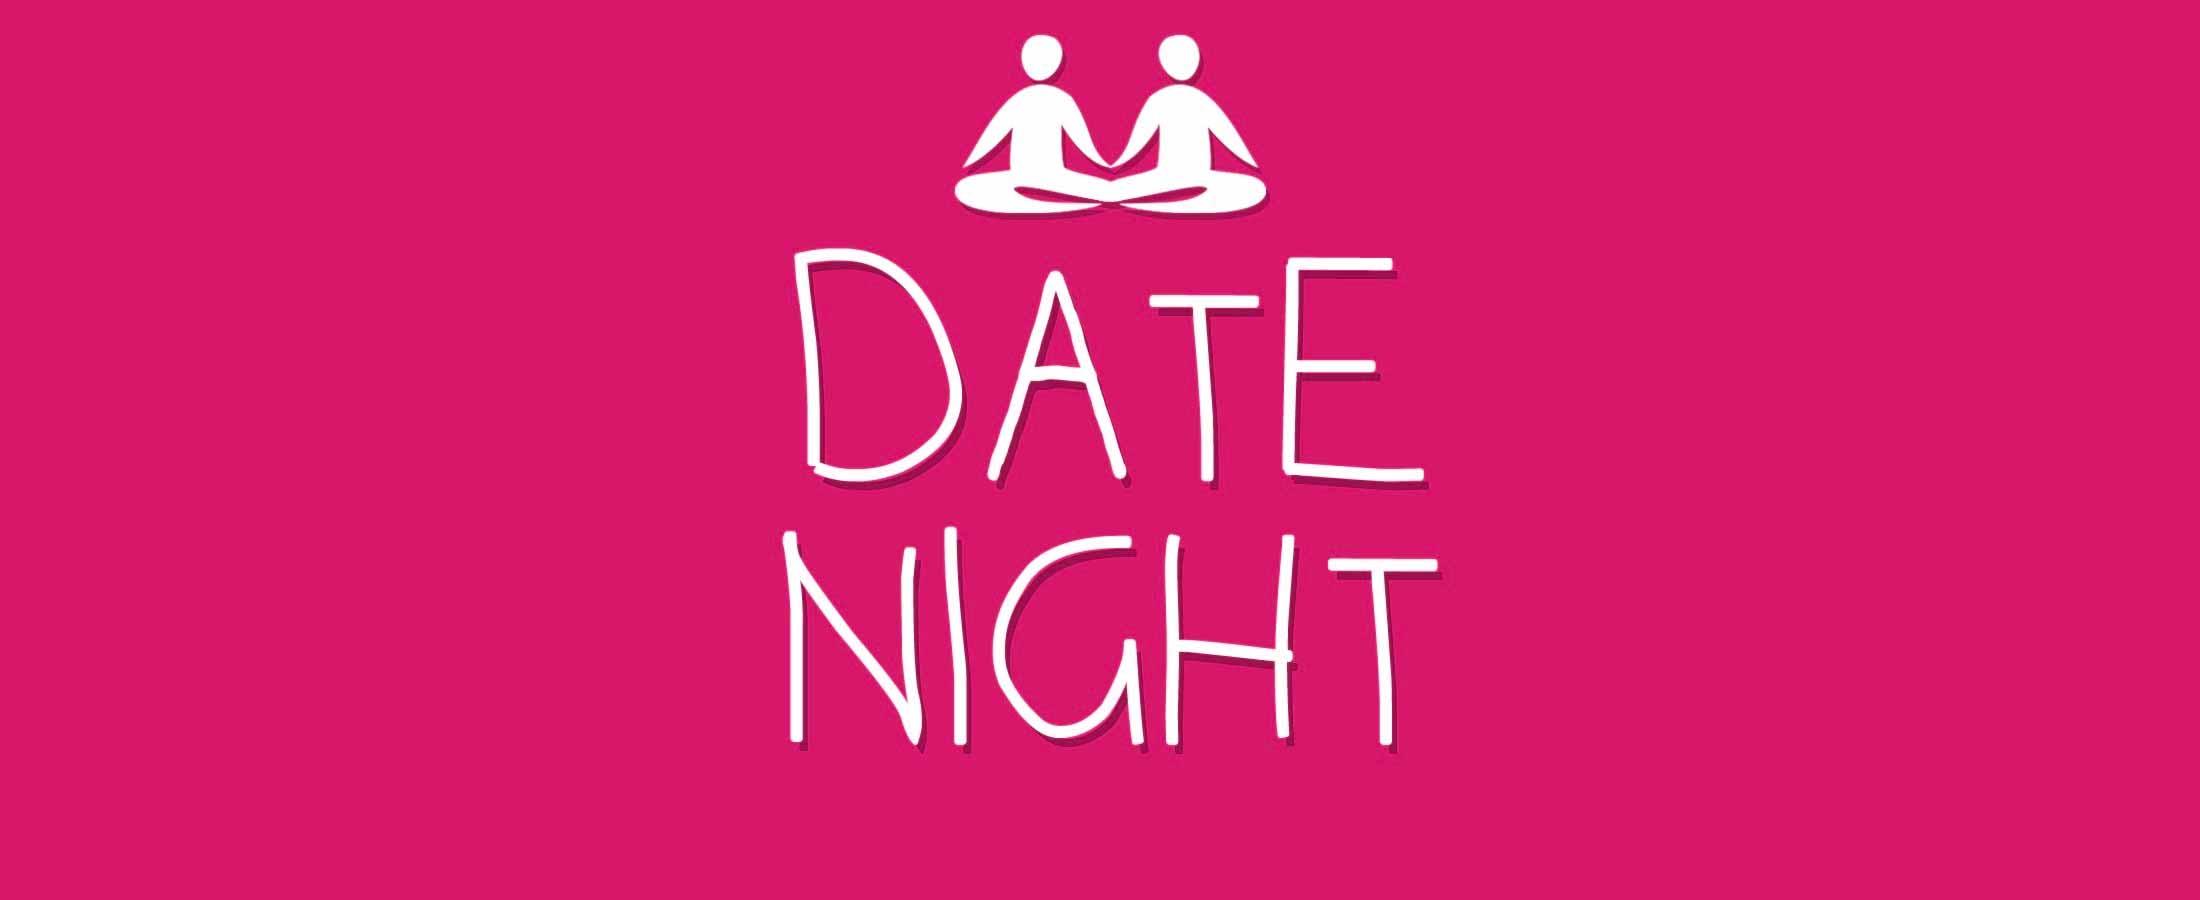 date night hot yoga markham